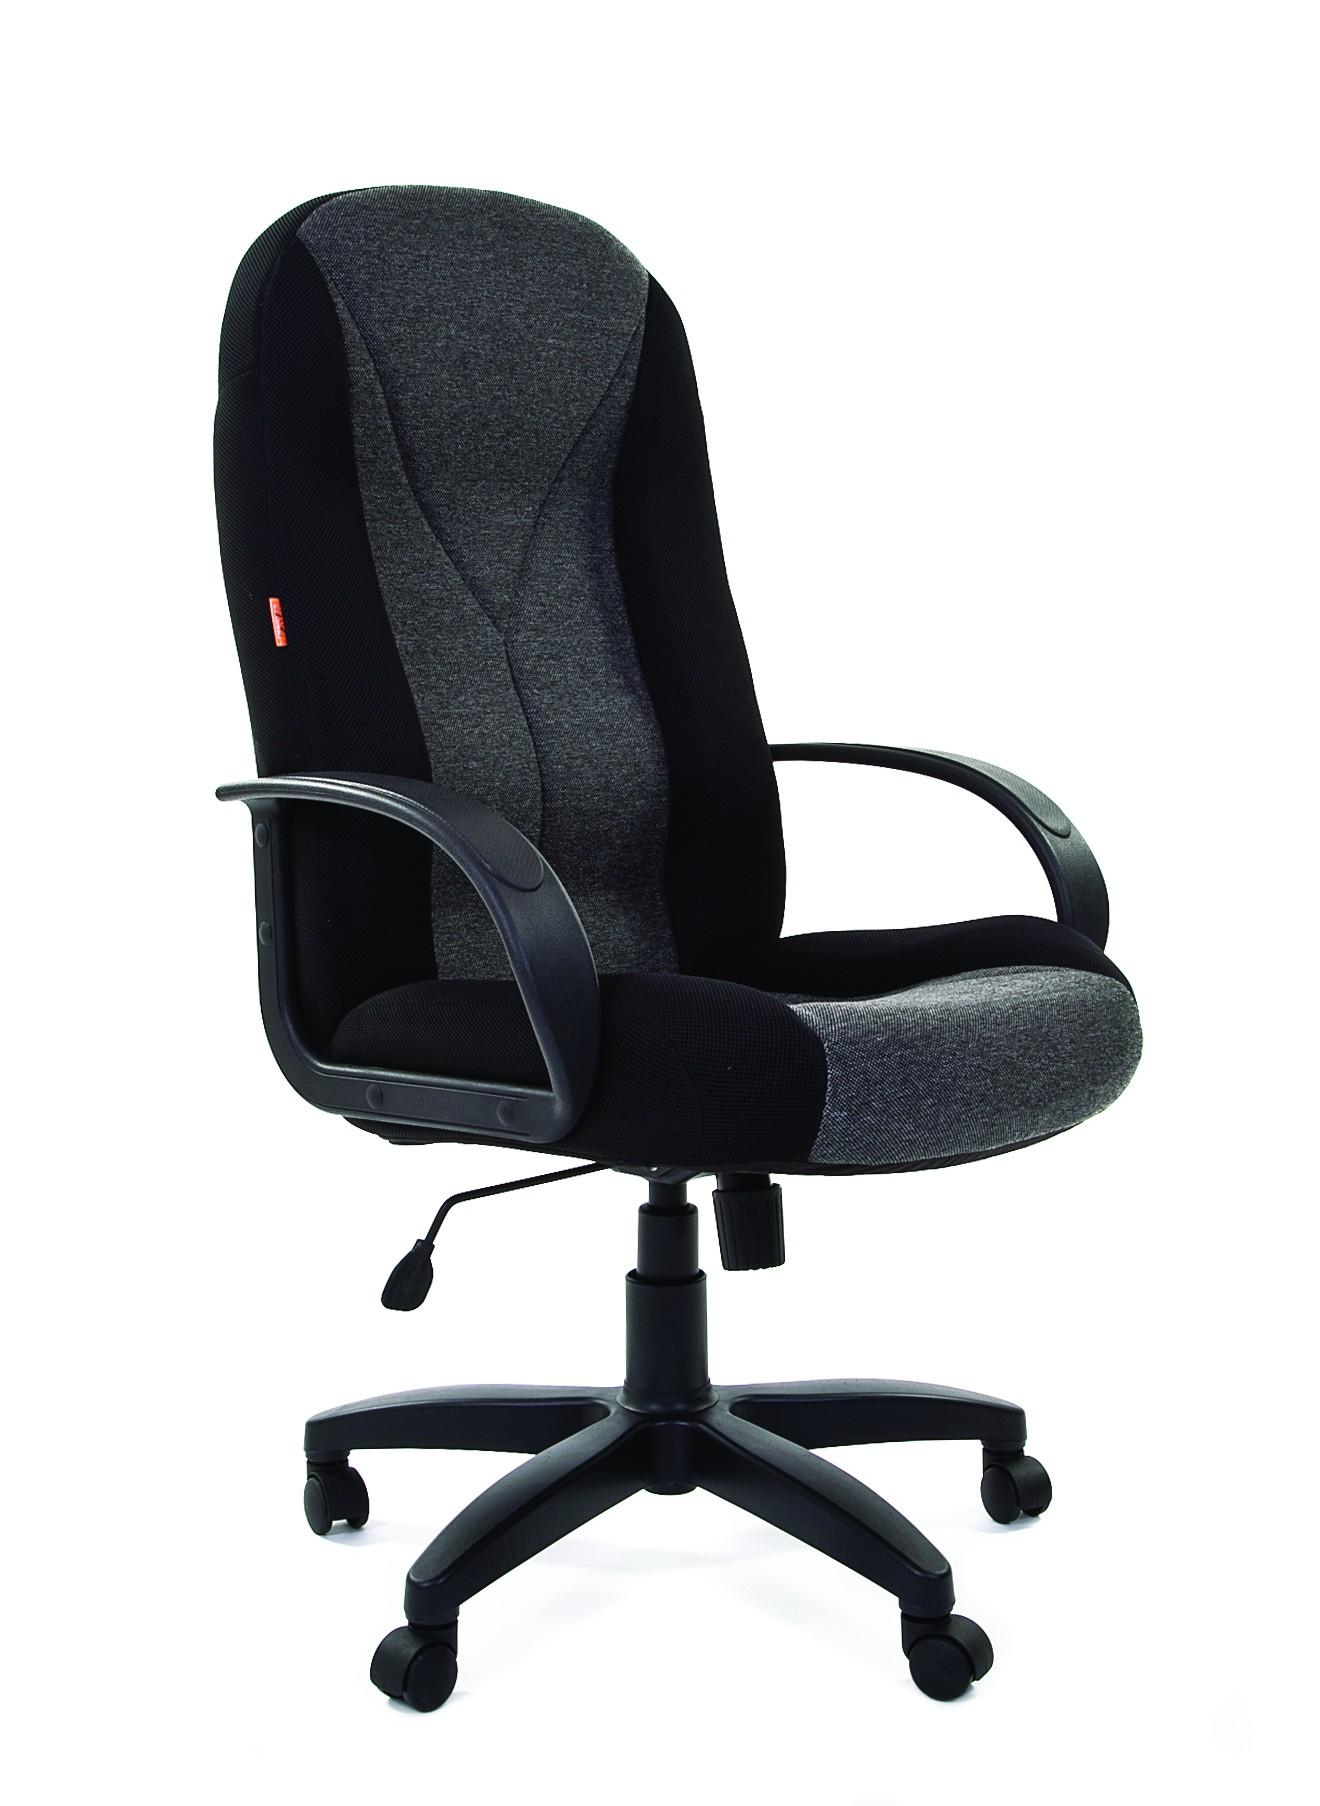 Biroja krēsls Chairman 785